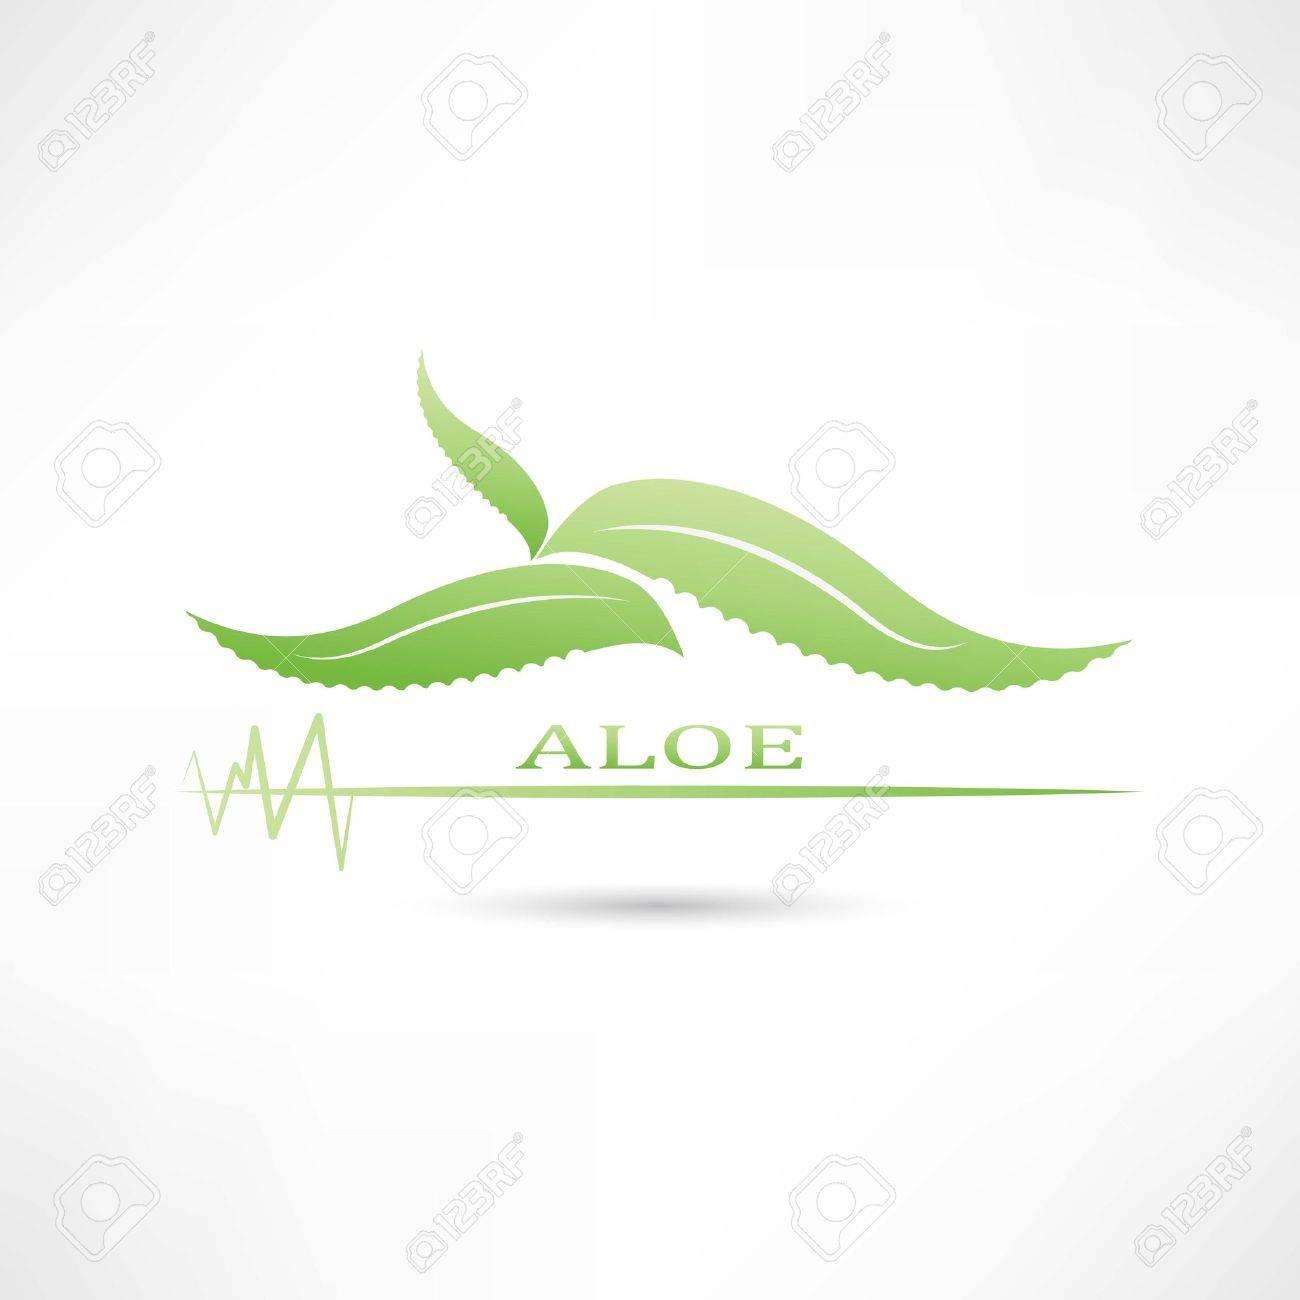 aloe green icon Standard-Bild - 24743398